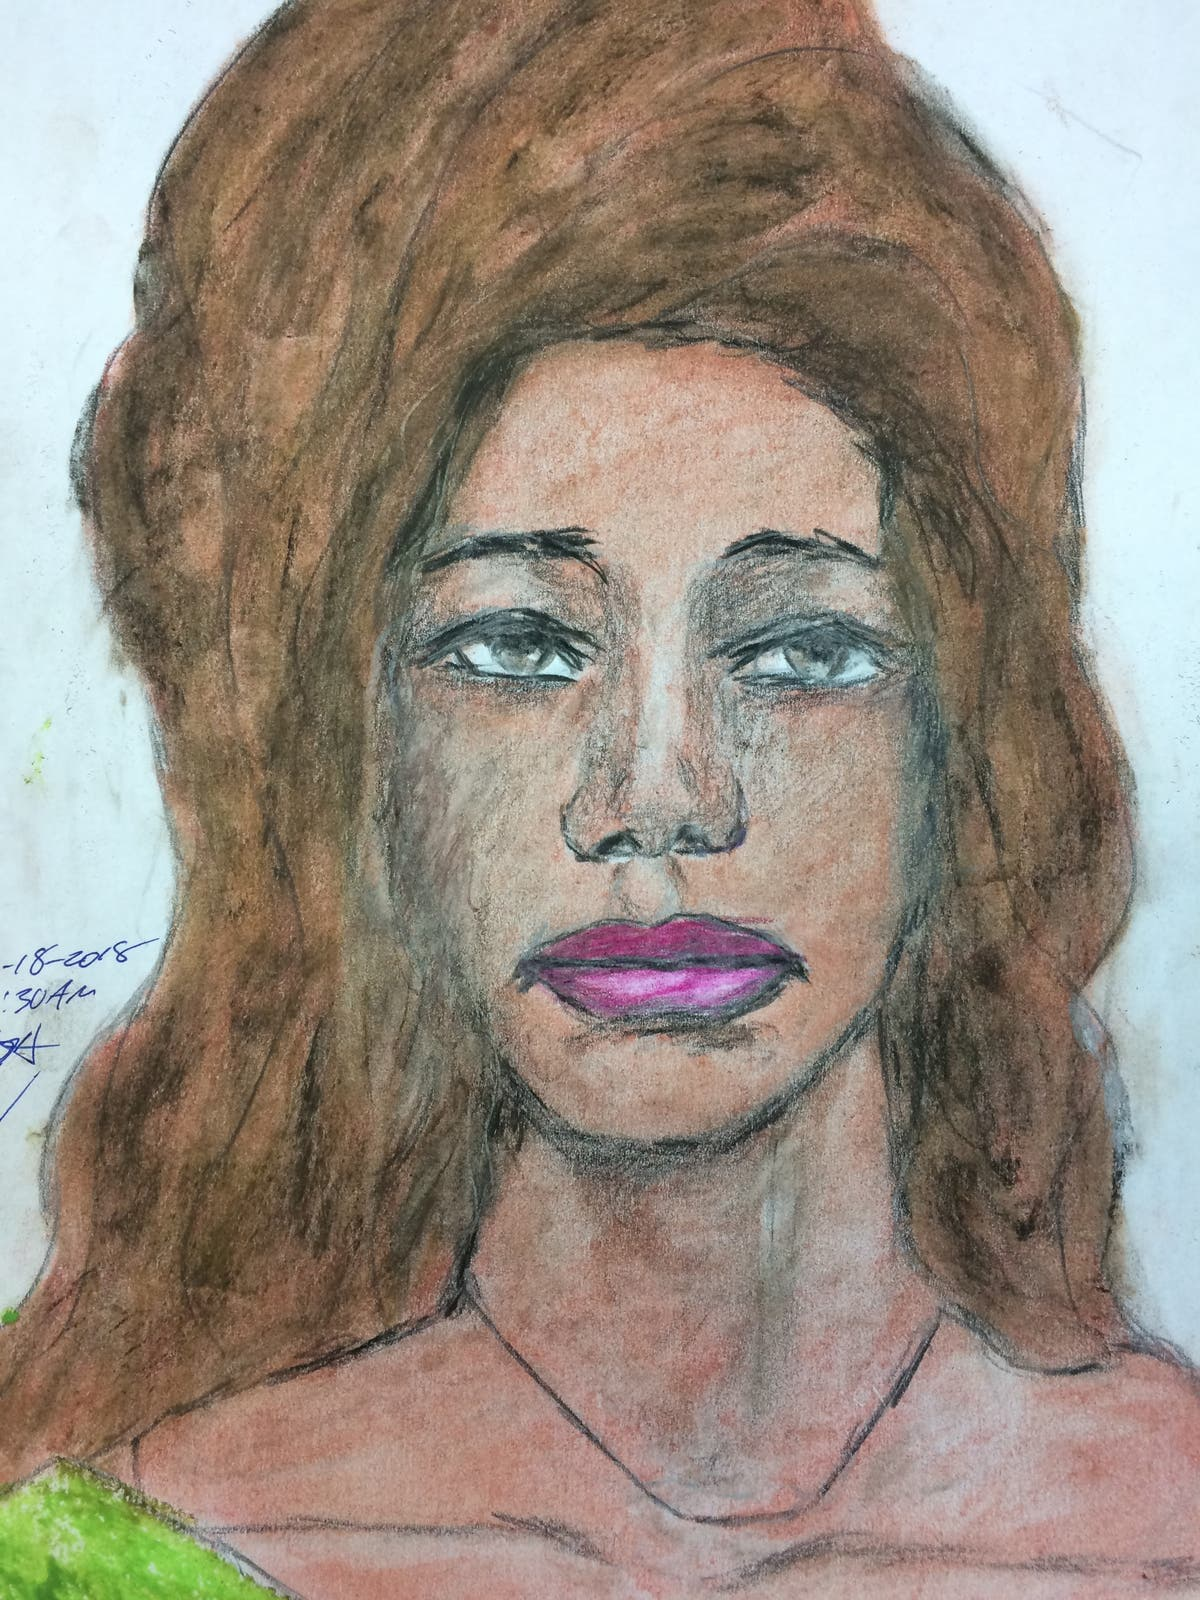 LA Serial Killer Linked To 90 Murders Sketches Missing